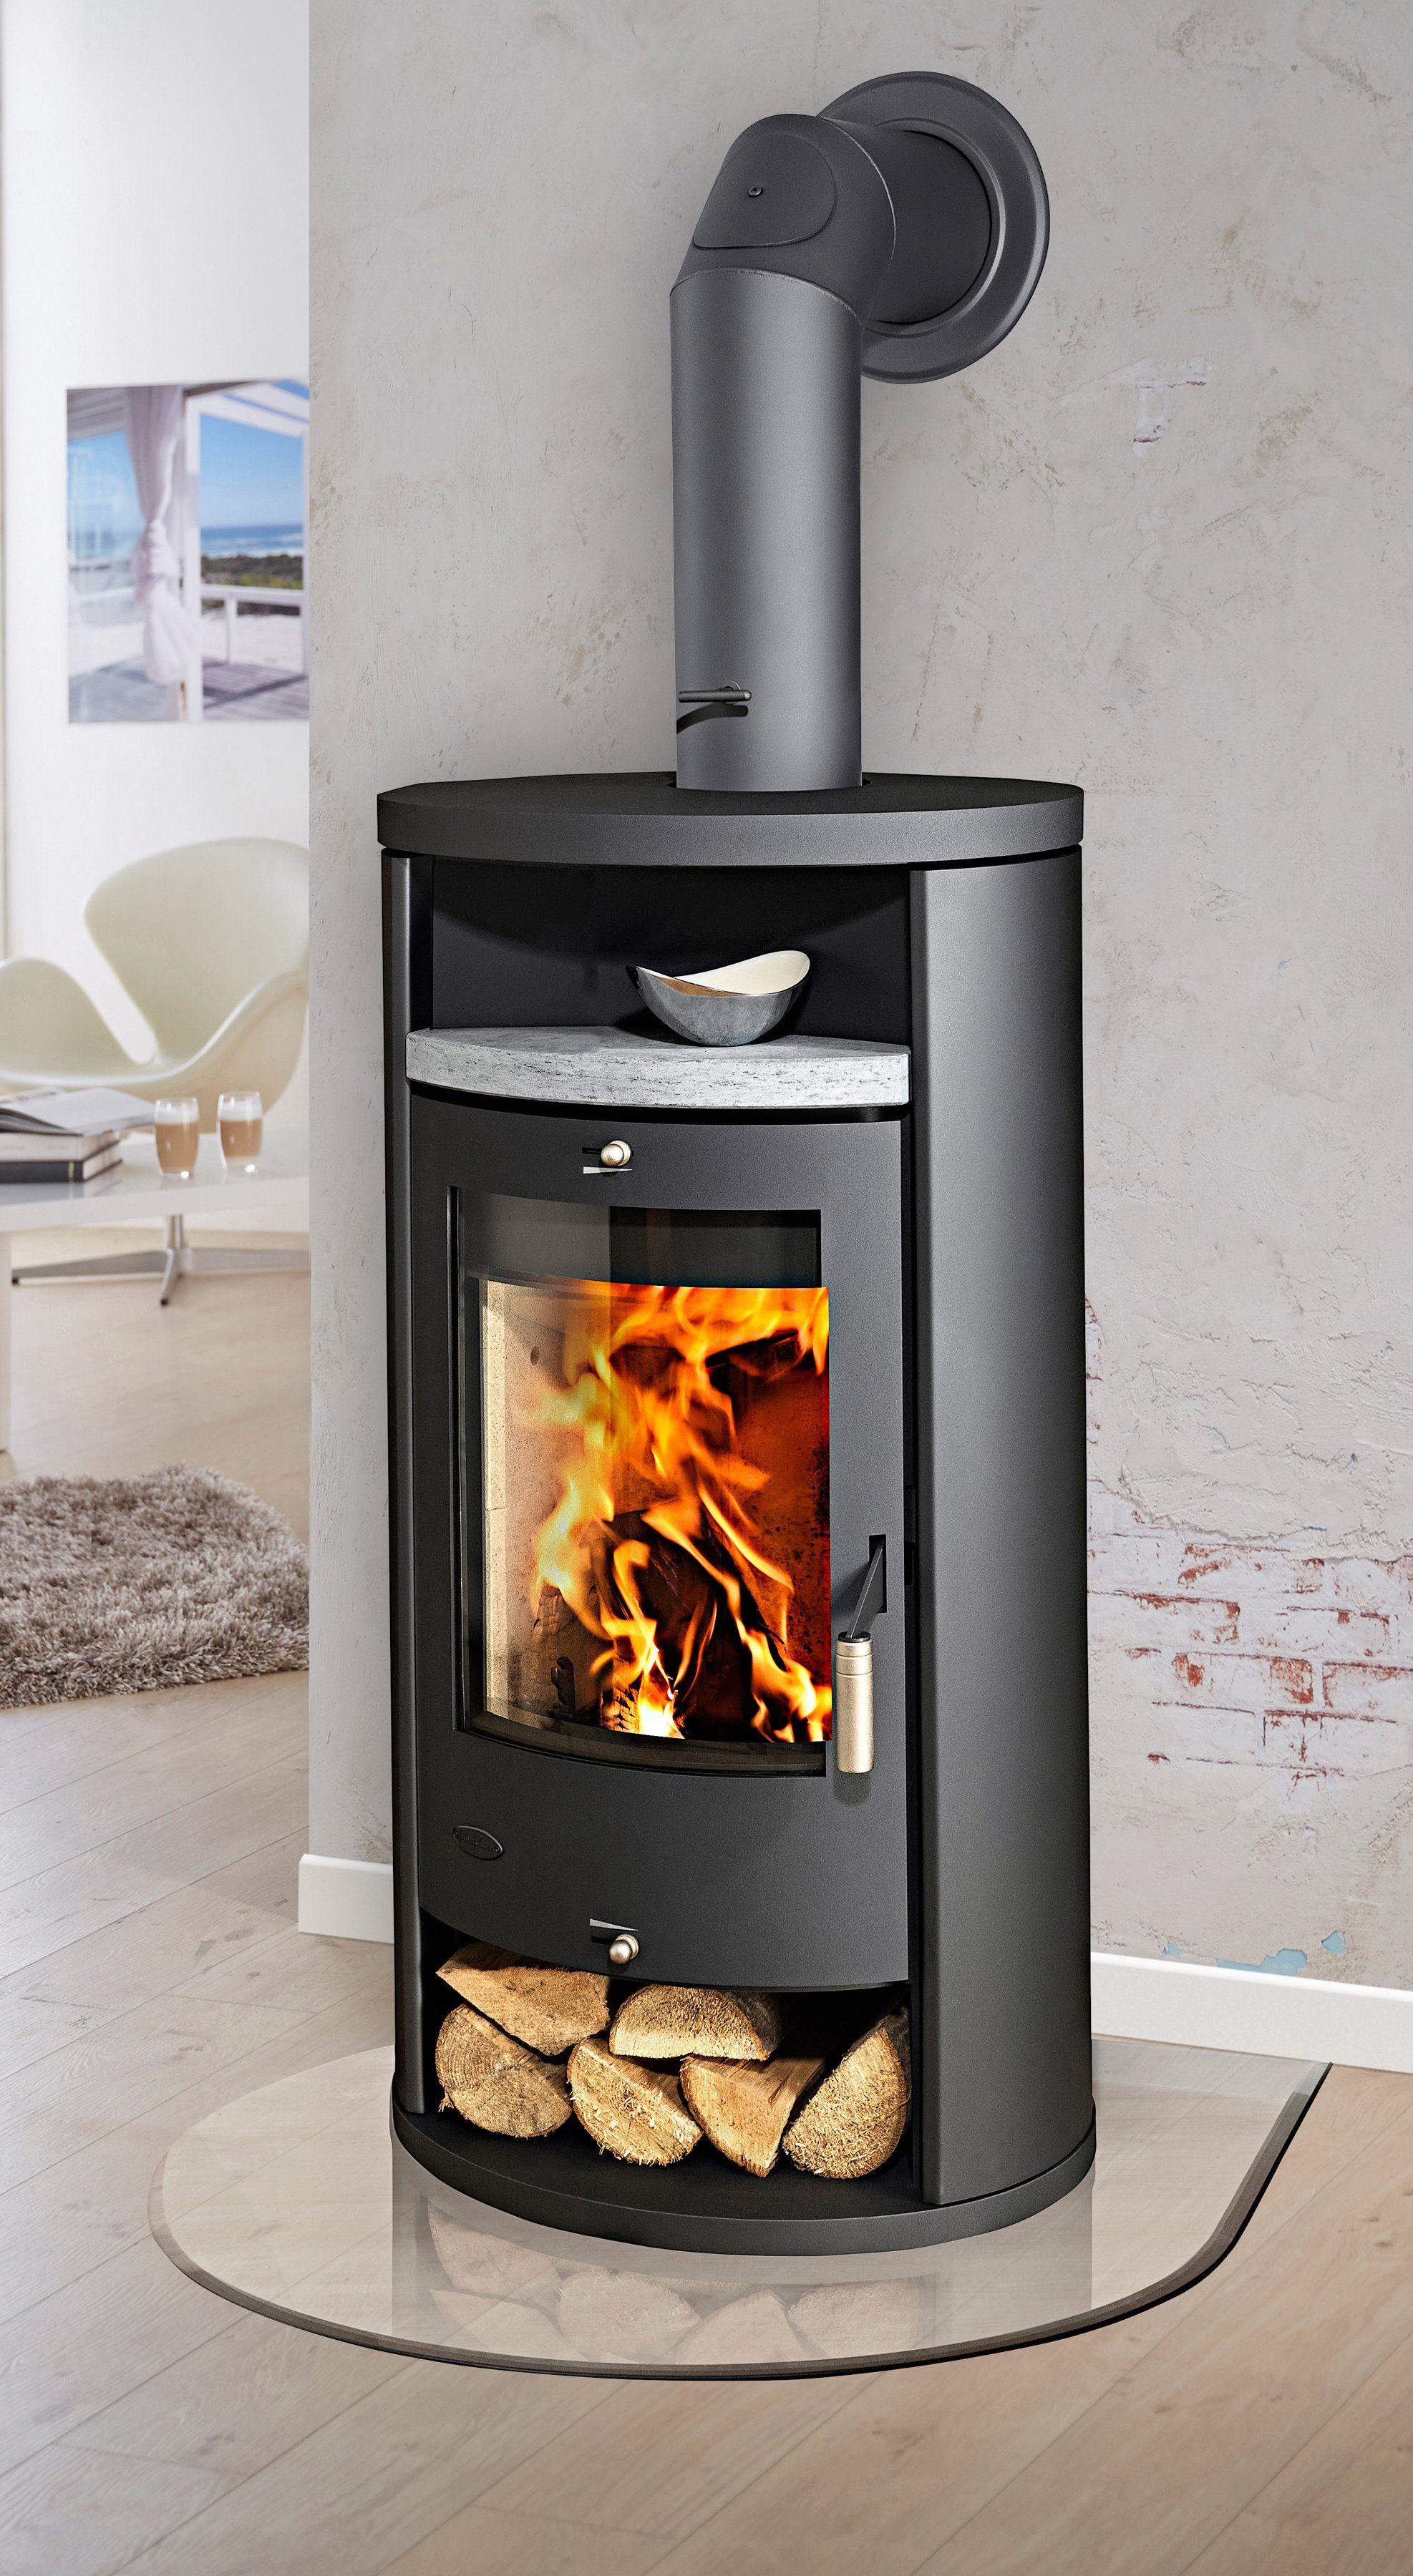 Kaminofen »Alicante«, Stahl, 8 kW, Fireplace